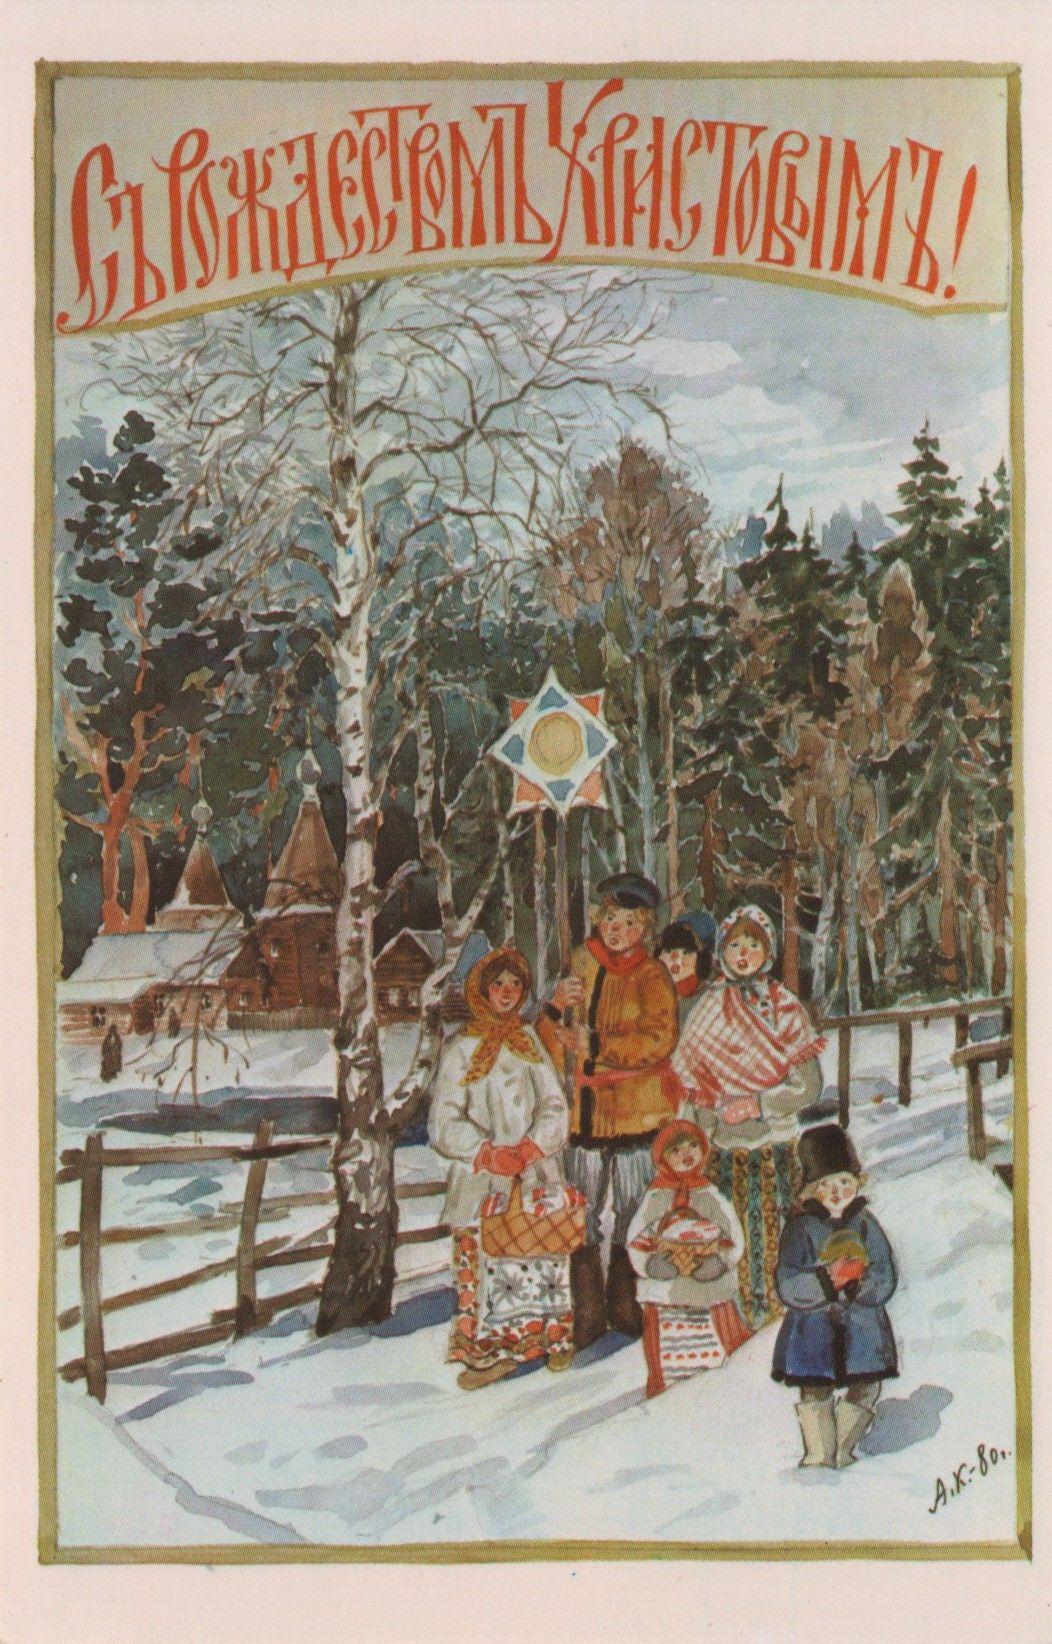 Russian Christmas Cards | Christmas cards, Cards and Wonderful time